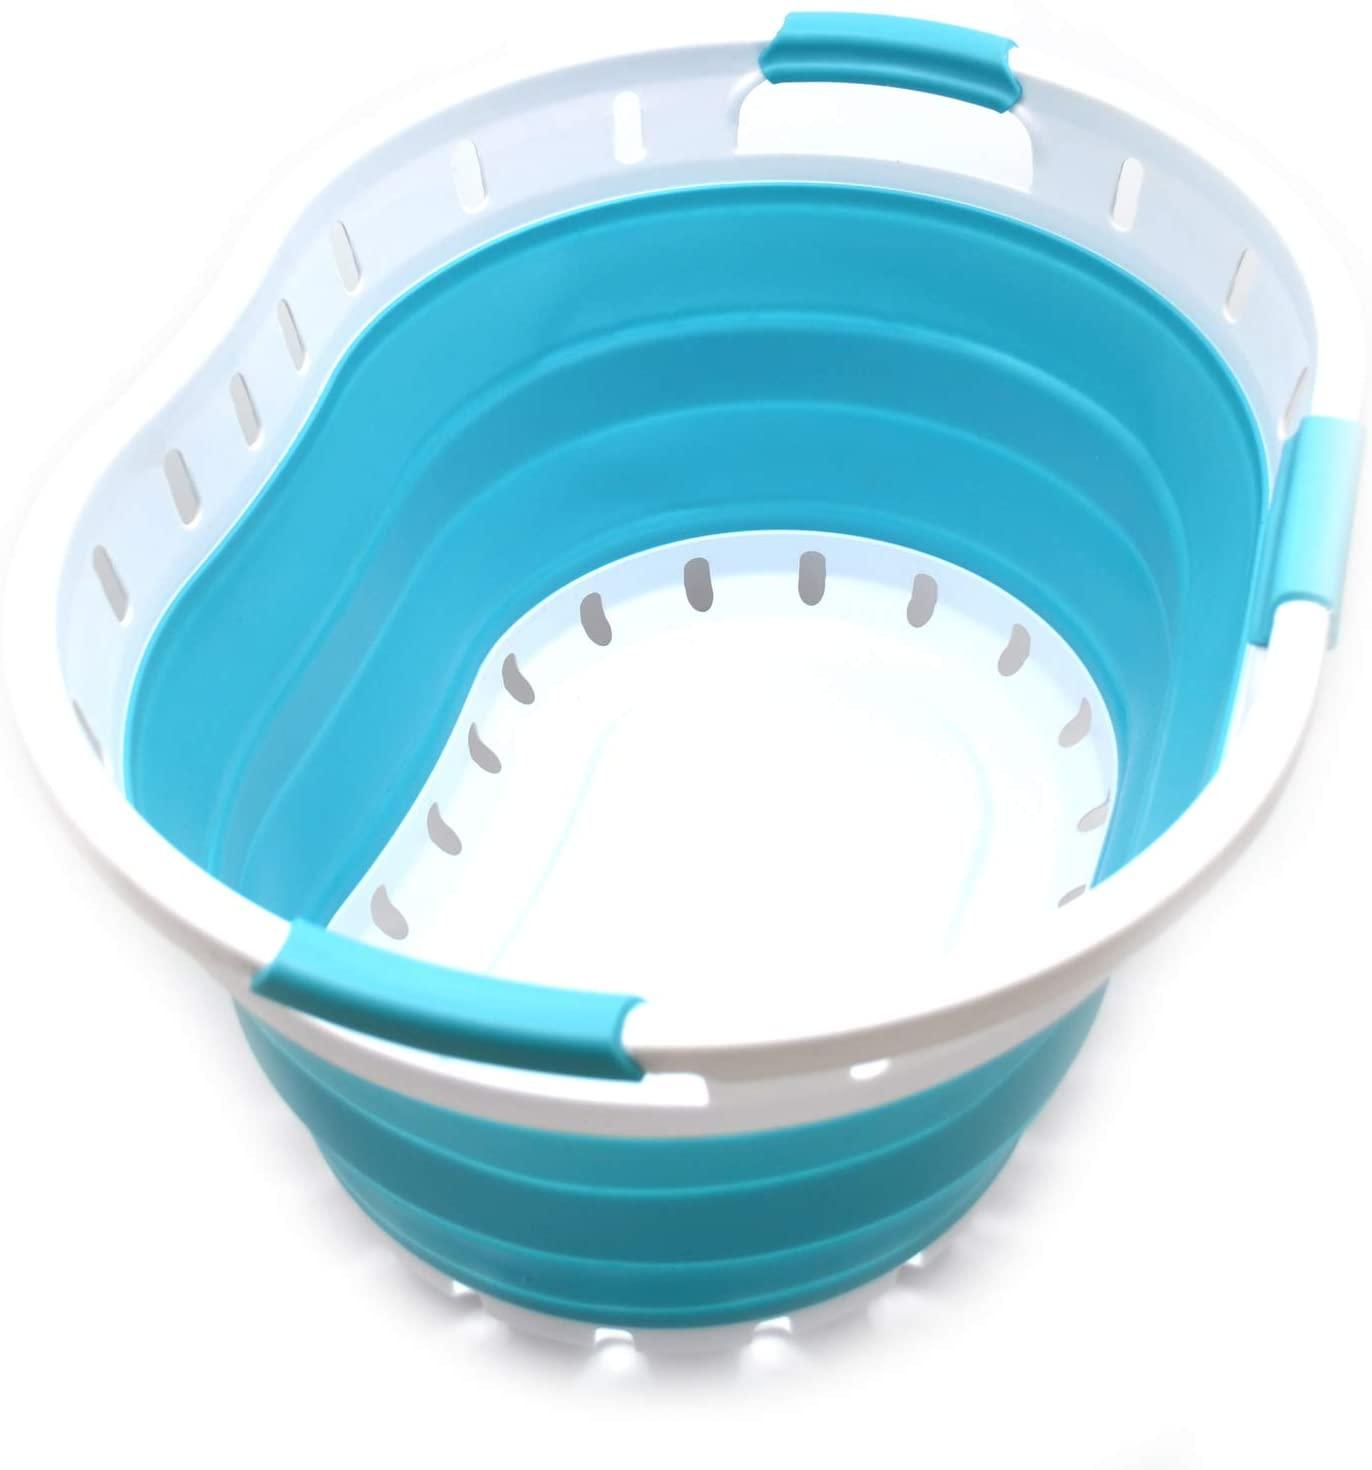 SAMMART Collapsible 3 Handled Plastic Laundry Basket - Oval Tub/Basket - Foldable Storage Container/Organizer - Portable Washing Tub - Space Saving Laundry Hamper (Bright Blue)